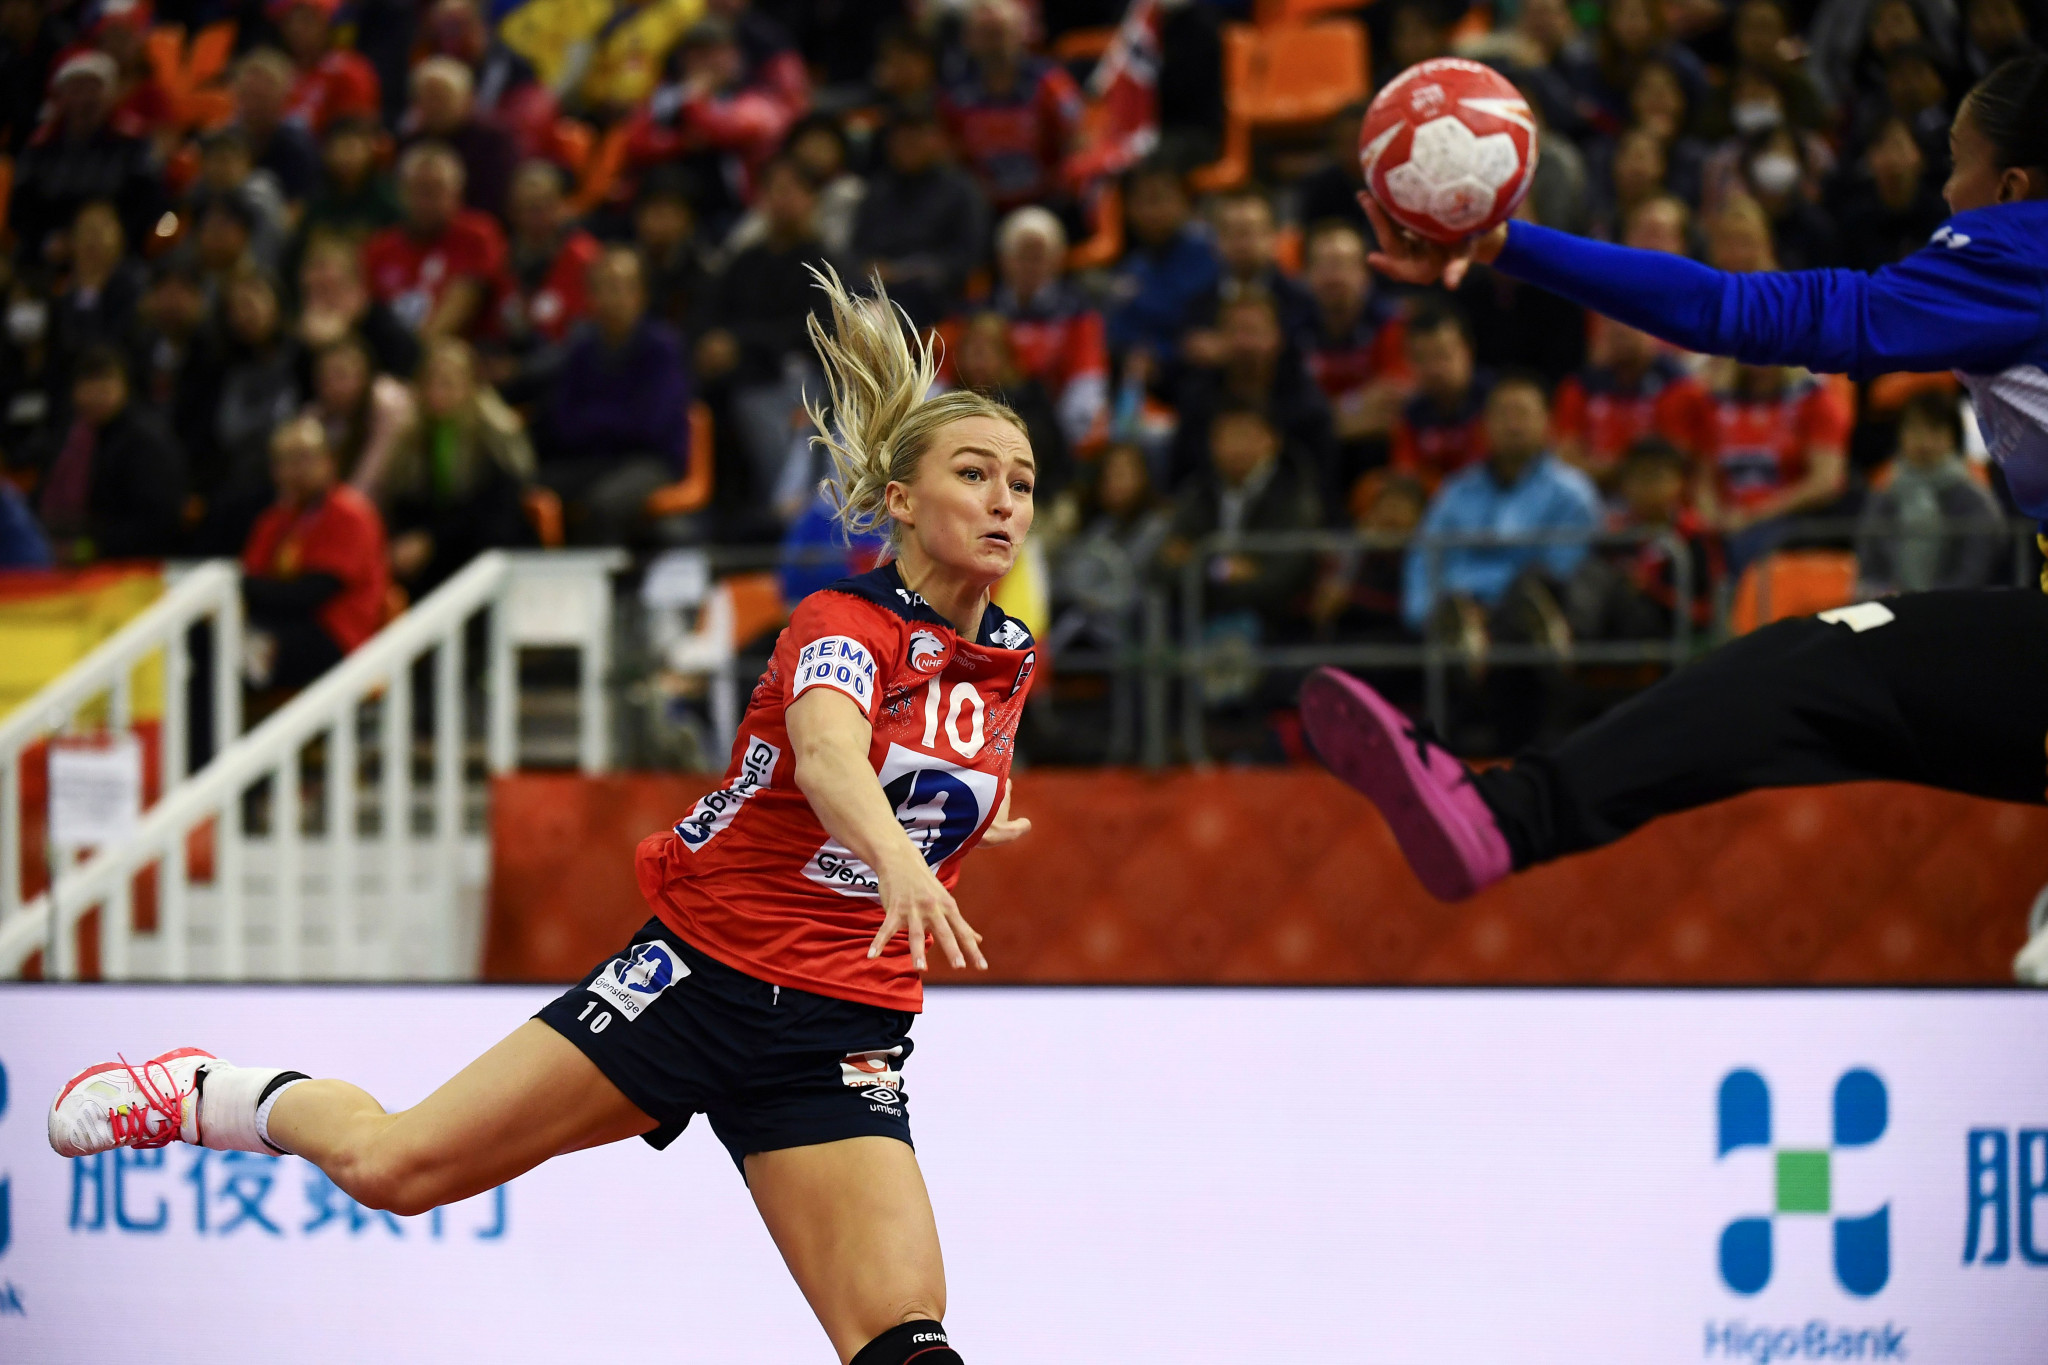 European Women's Handball Championship given green light as final moved to Trondheim